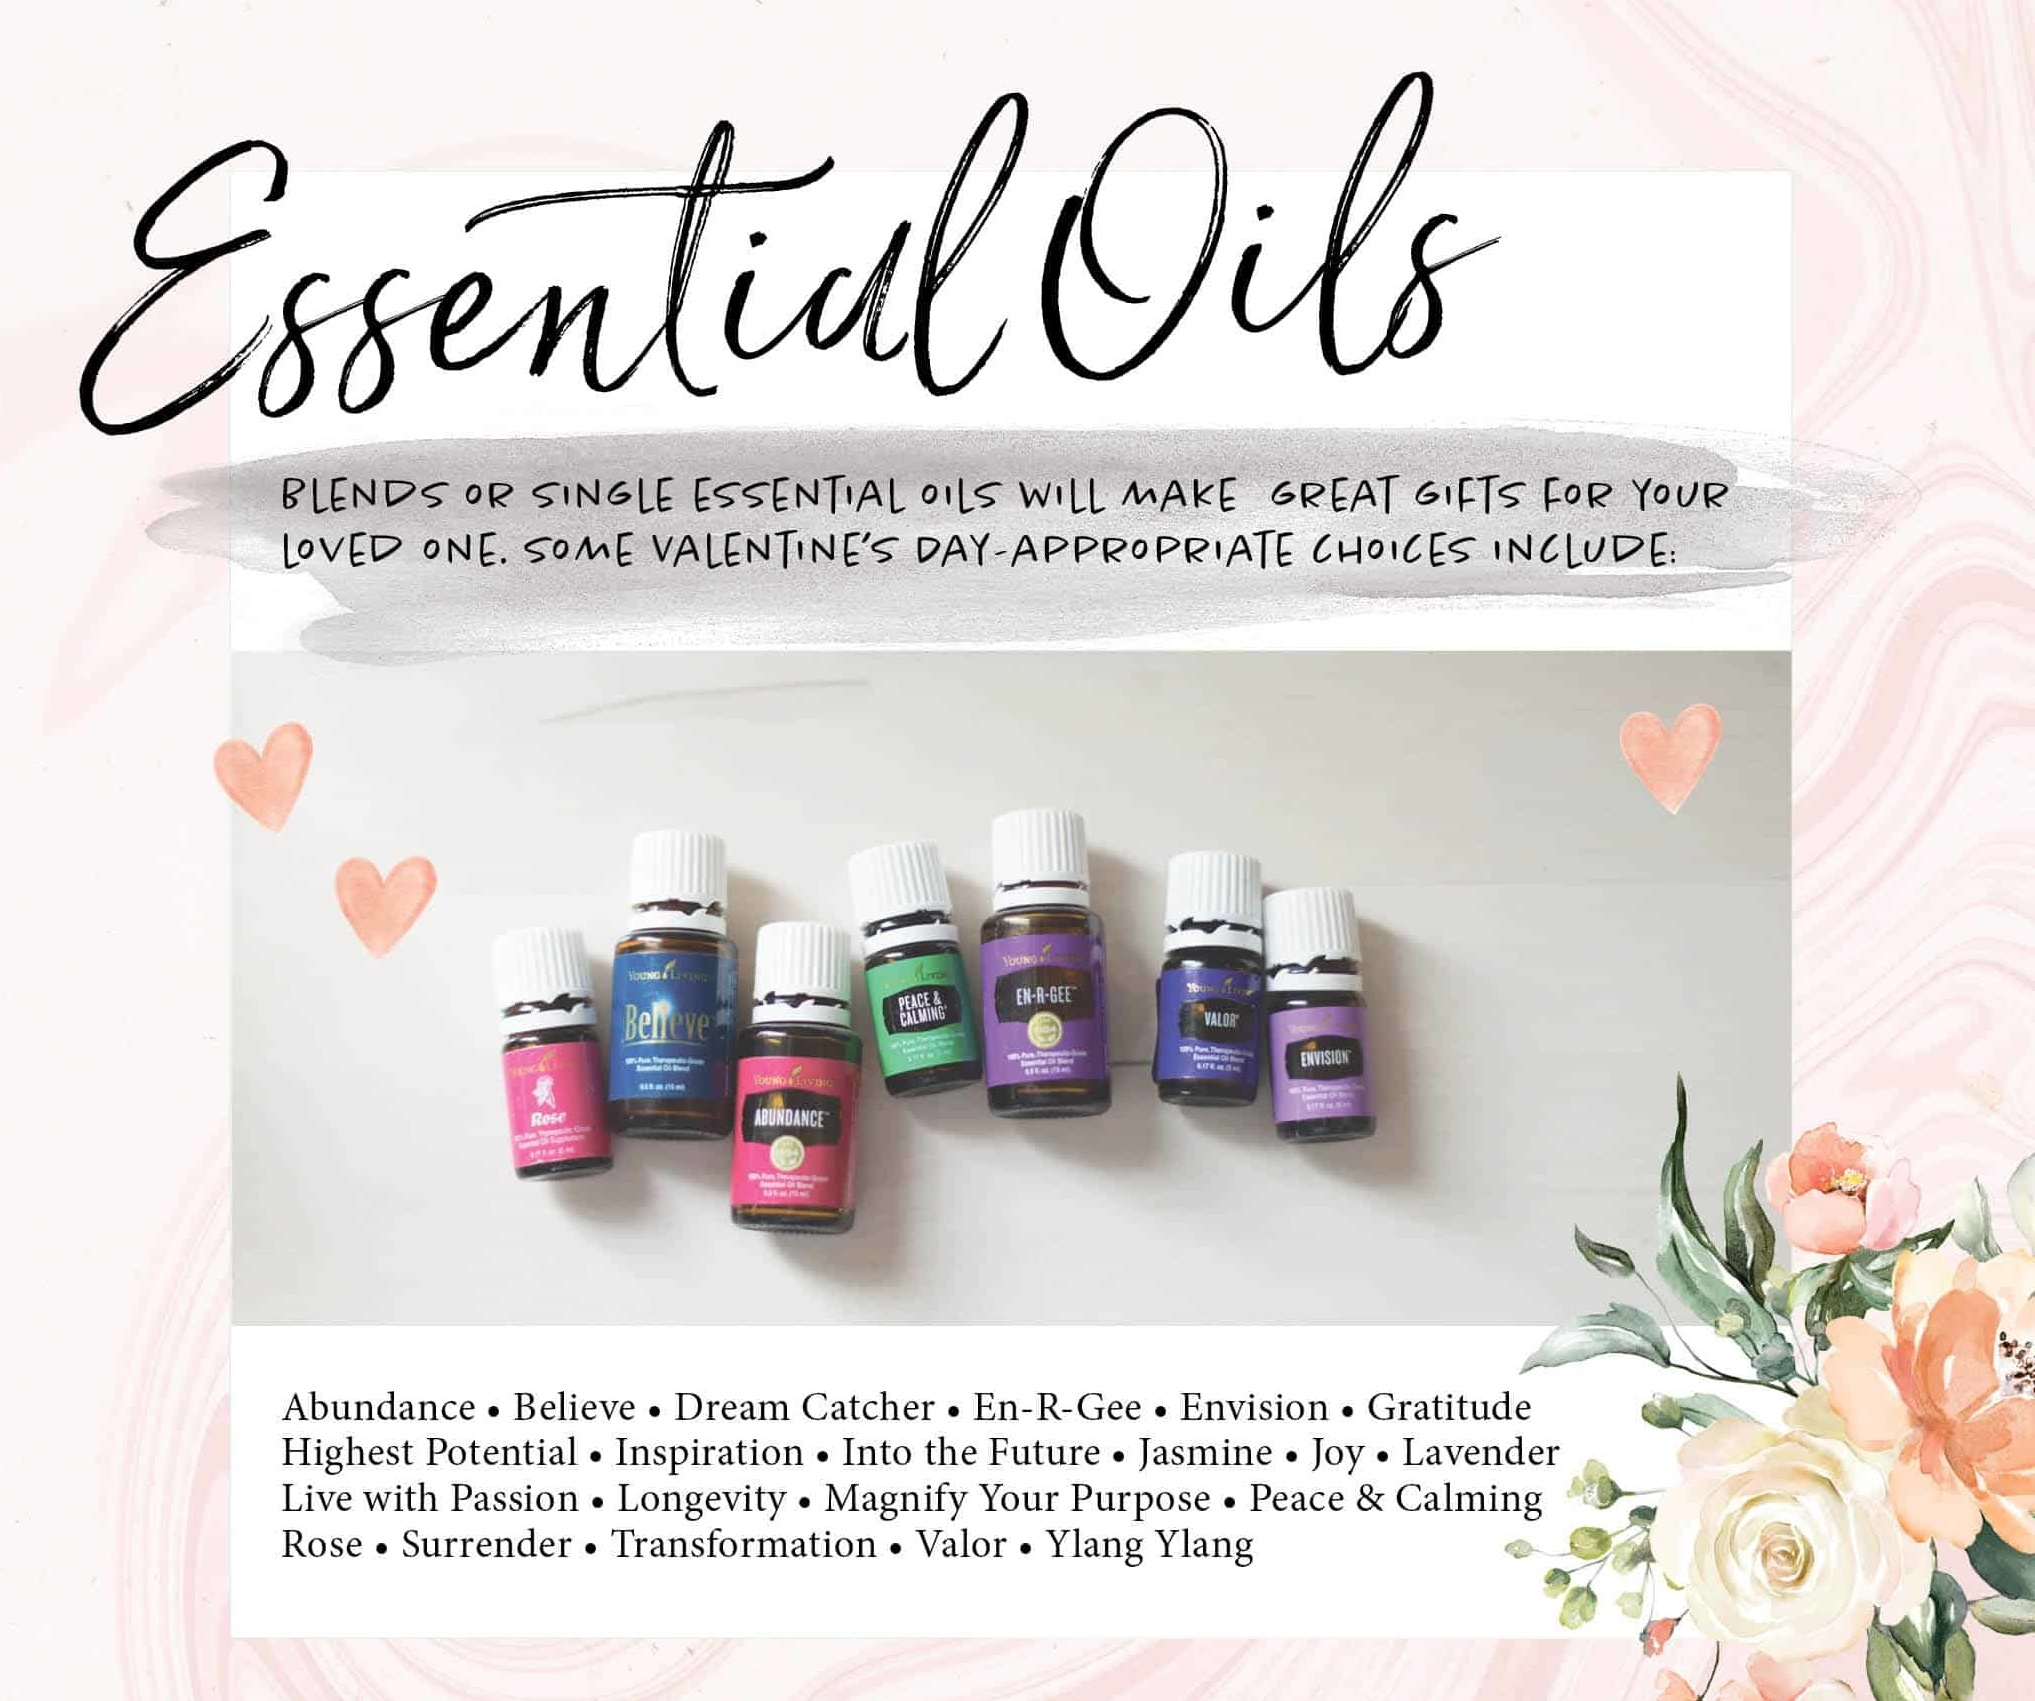 VDay8-Essential-Oils.jpg